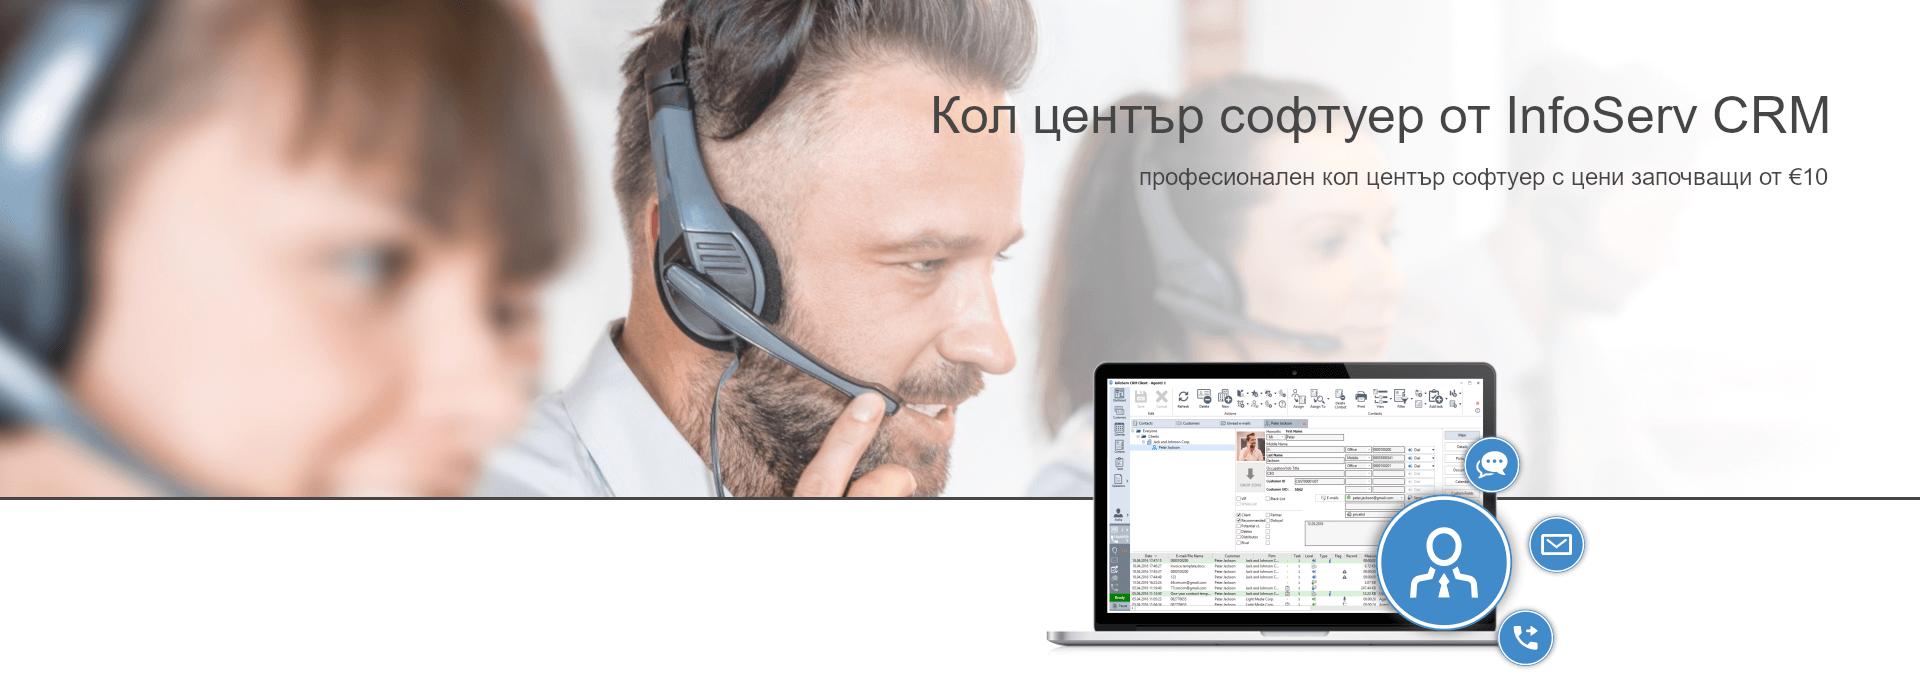 InfoServ CRM Call Center Software